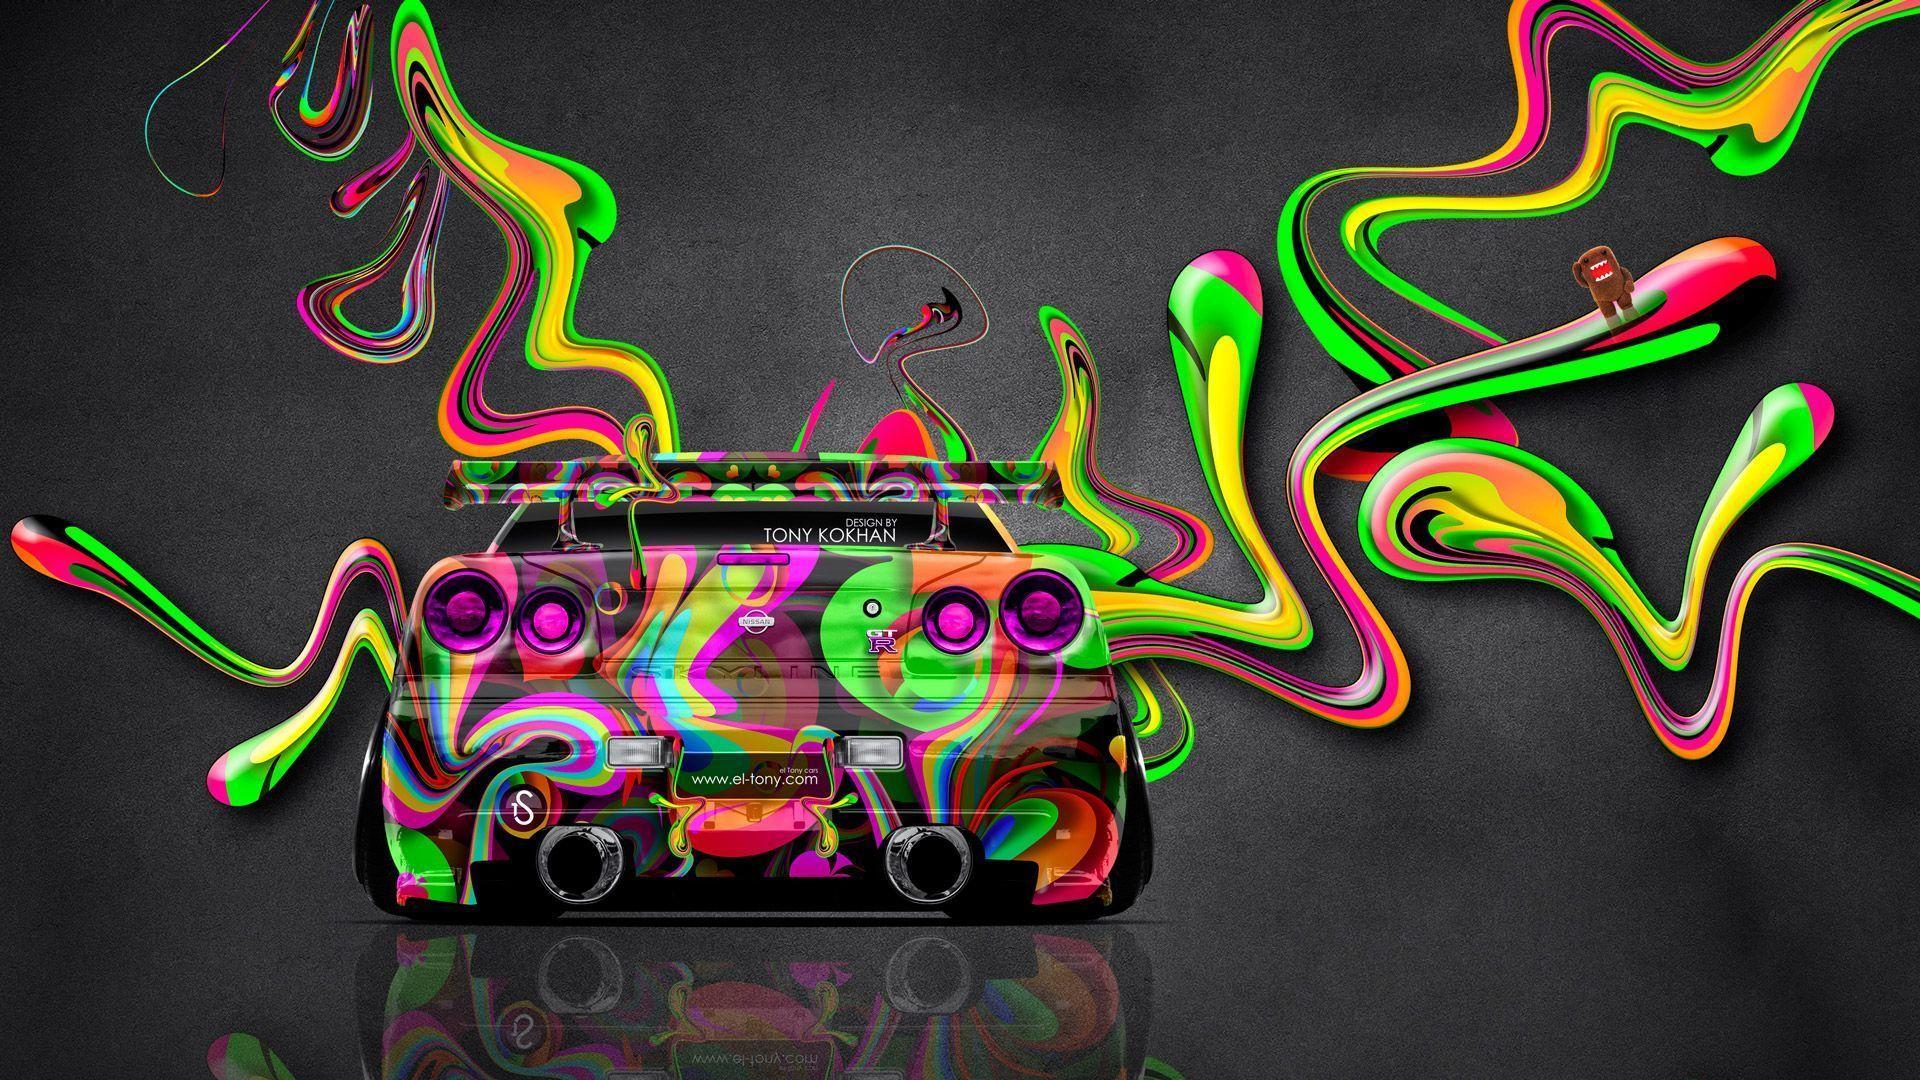 Nissan Skyline GTR R34 JDM Super Plastic Car 2014 « El Tony